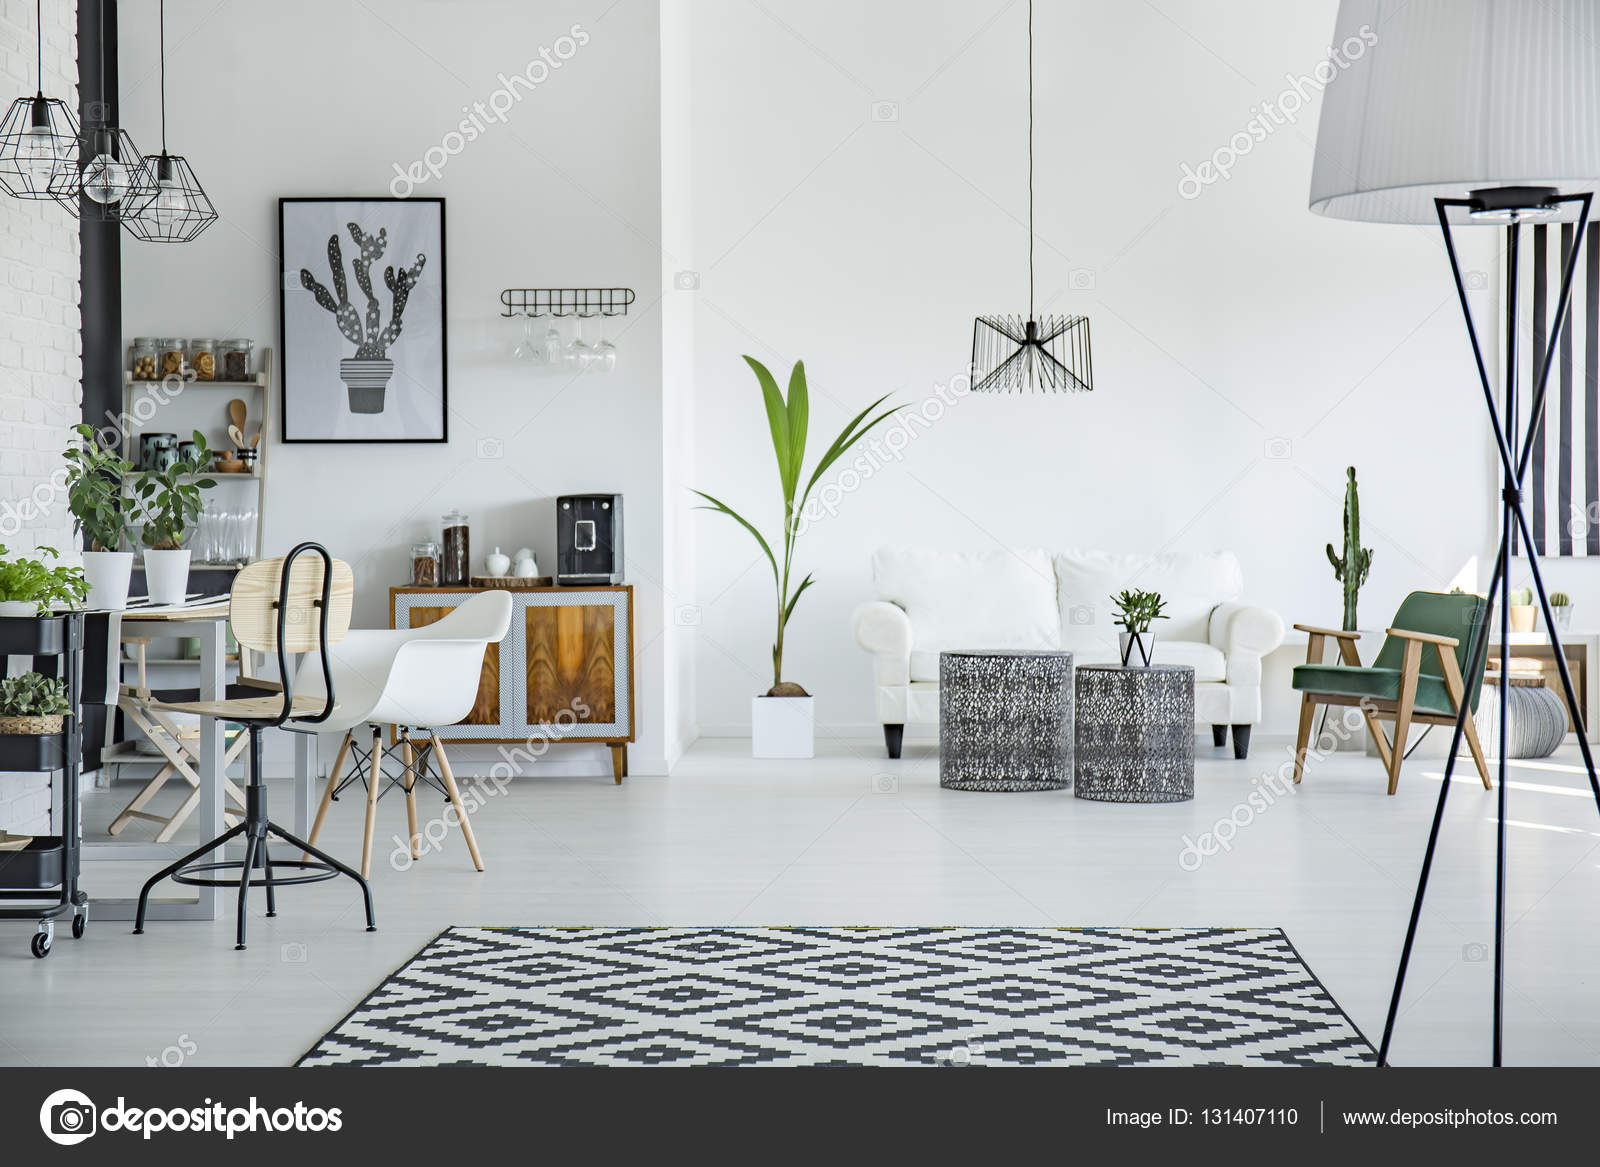 https://st3.depositphotos.com/2249091/13140/i/1600/depositphotos_131407110-stockafbeelding-loft-interieur-in-scandinavische-stijl.jpg